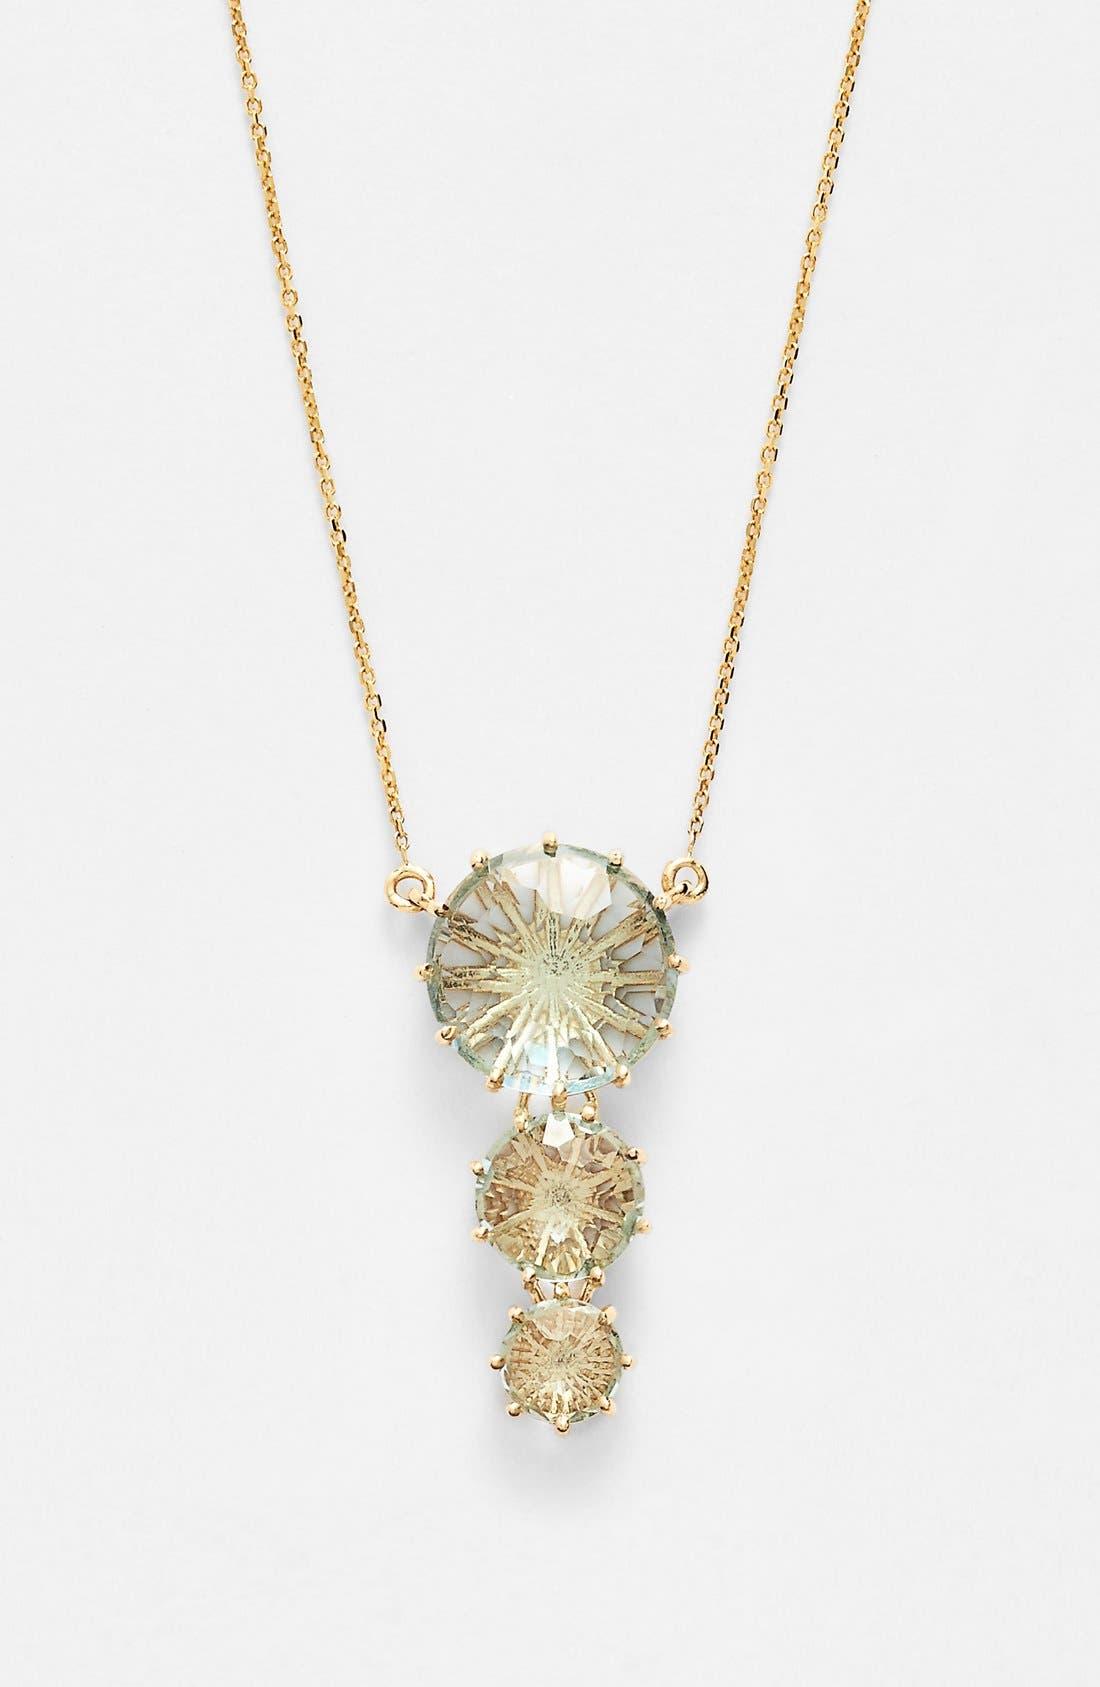 Main Image - KALAN by Suzanne Kalan Stone Pendant Necklace